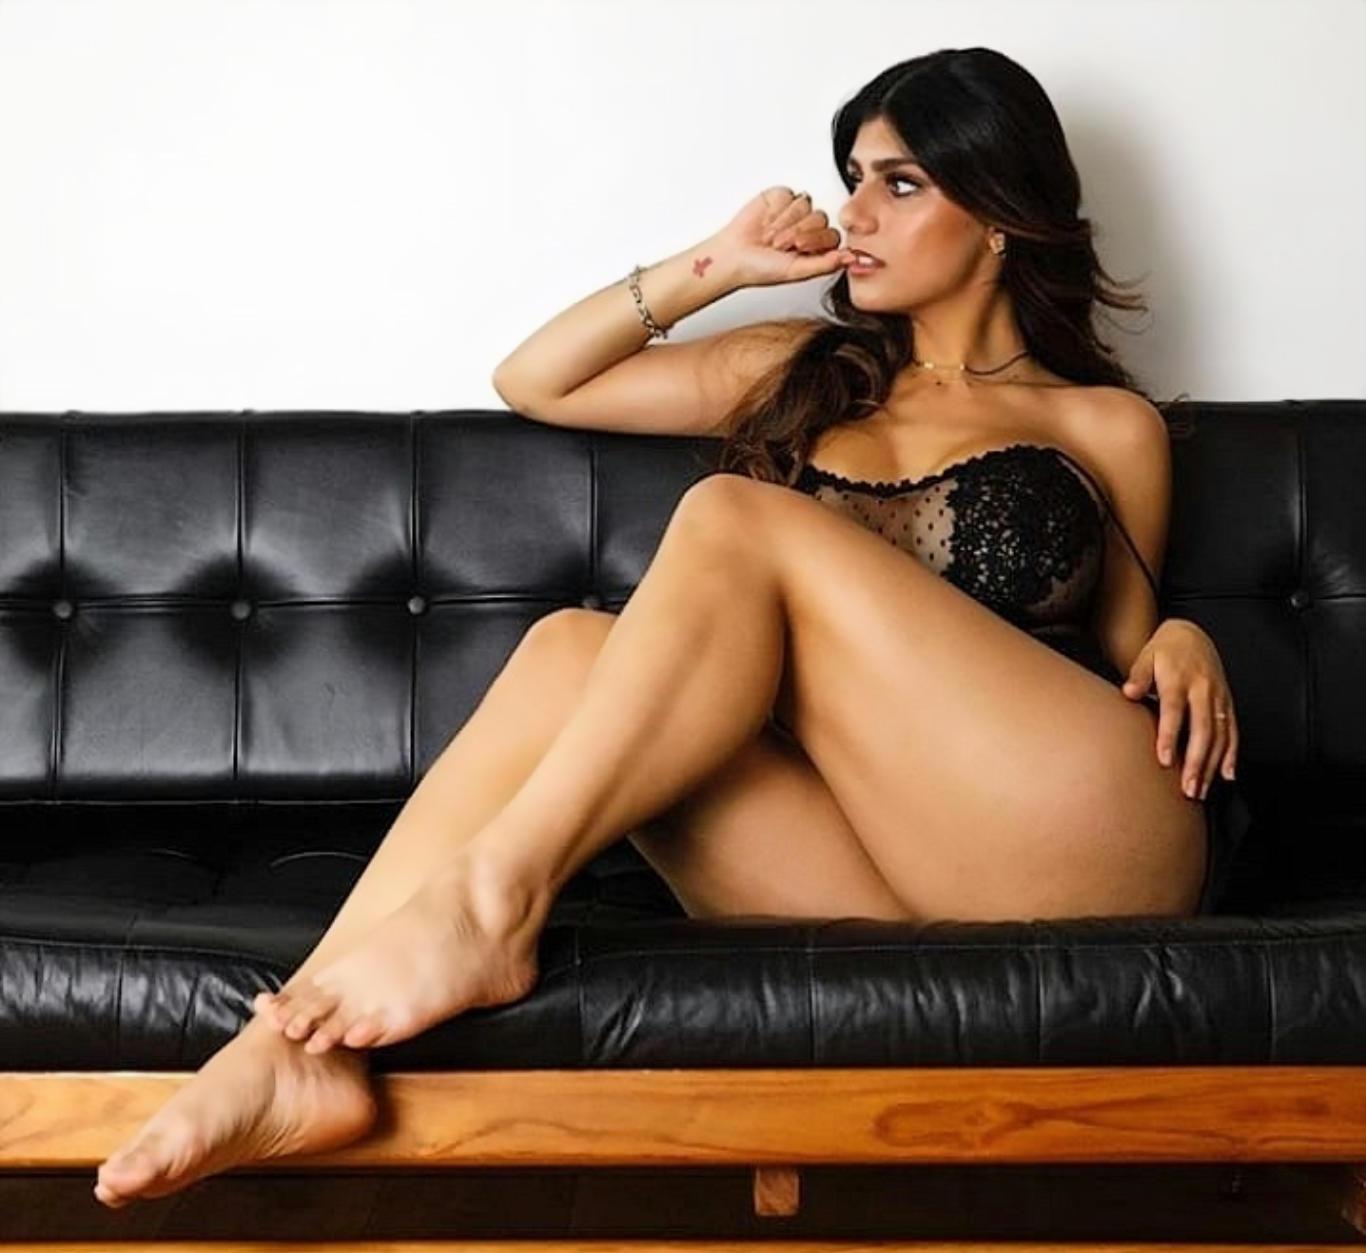 Mia Khalifa Super Sexy Wallpaper